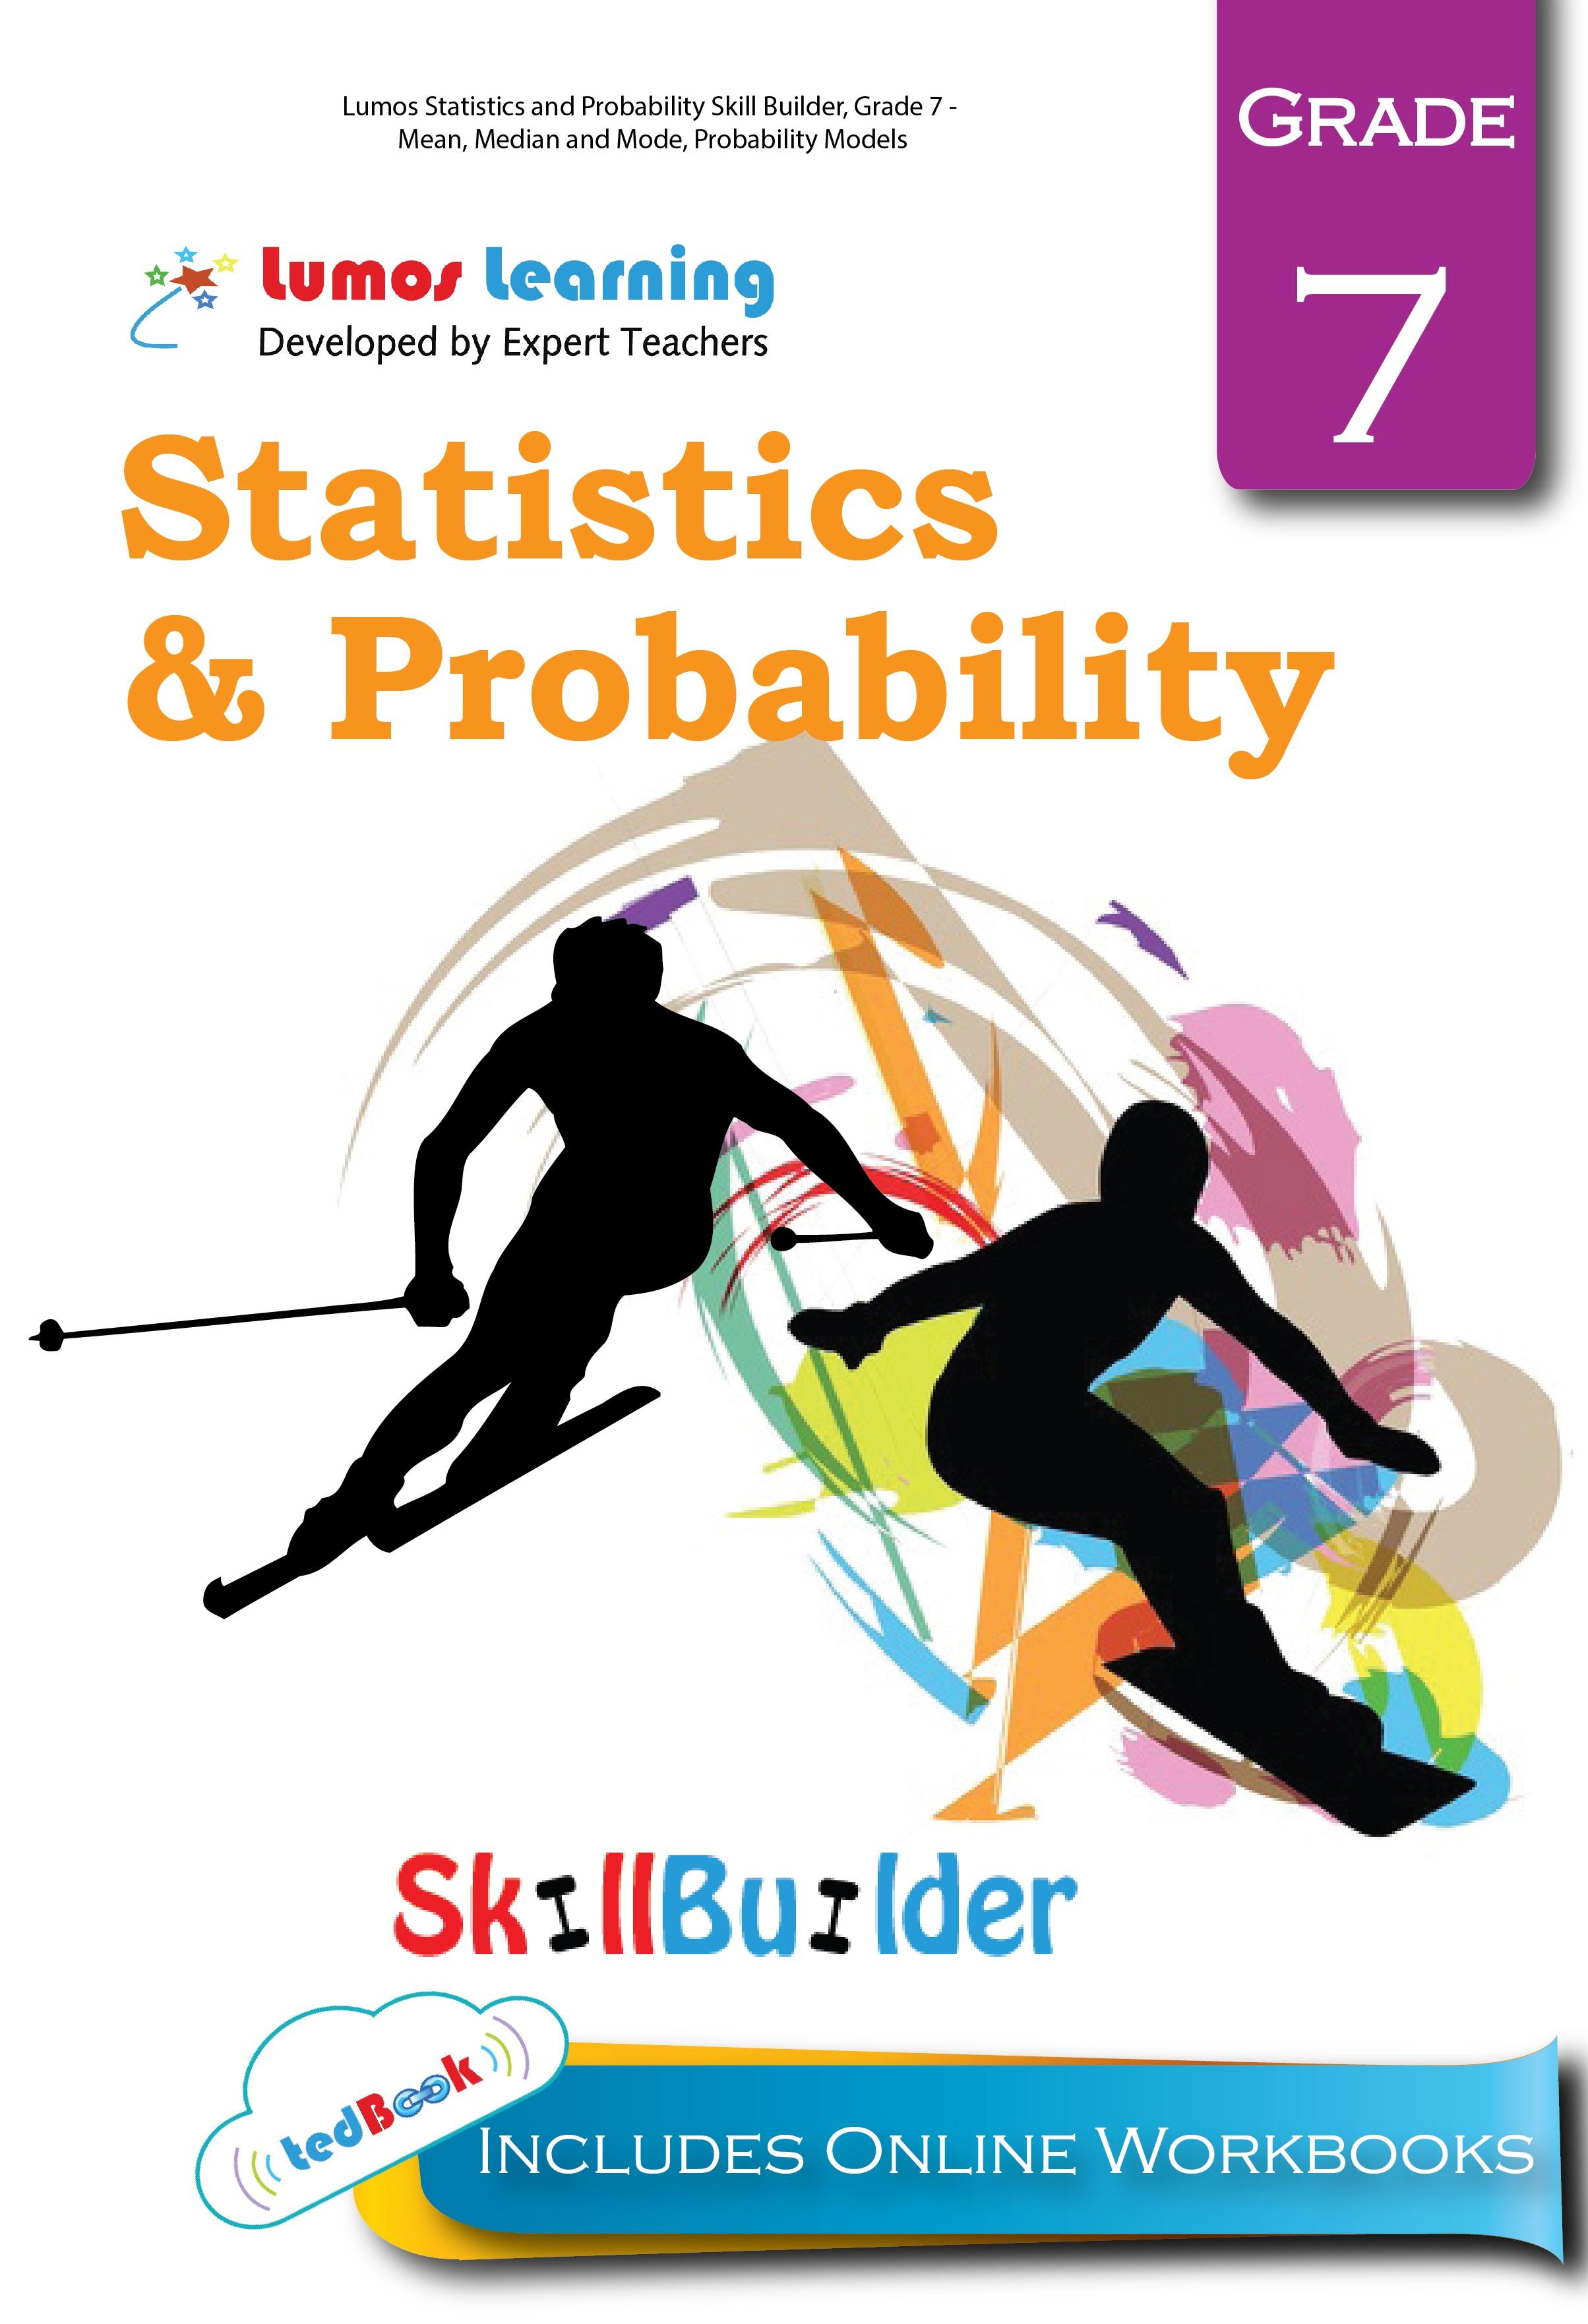 Statistics and Probability grade 7